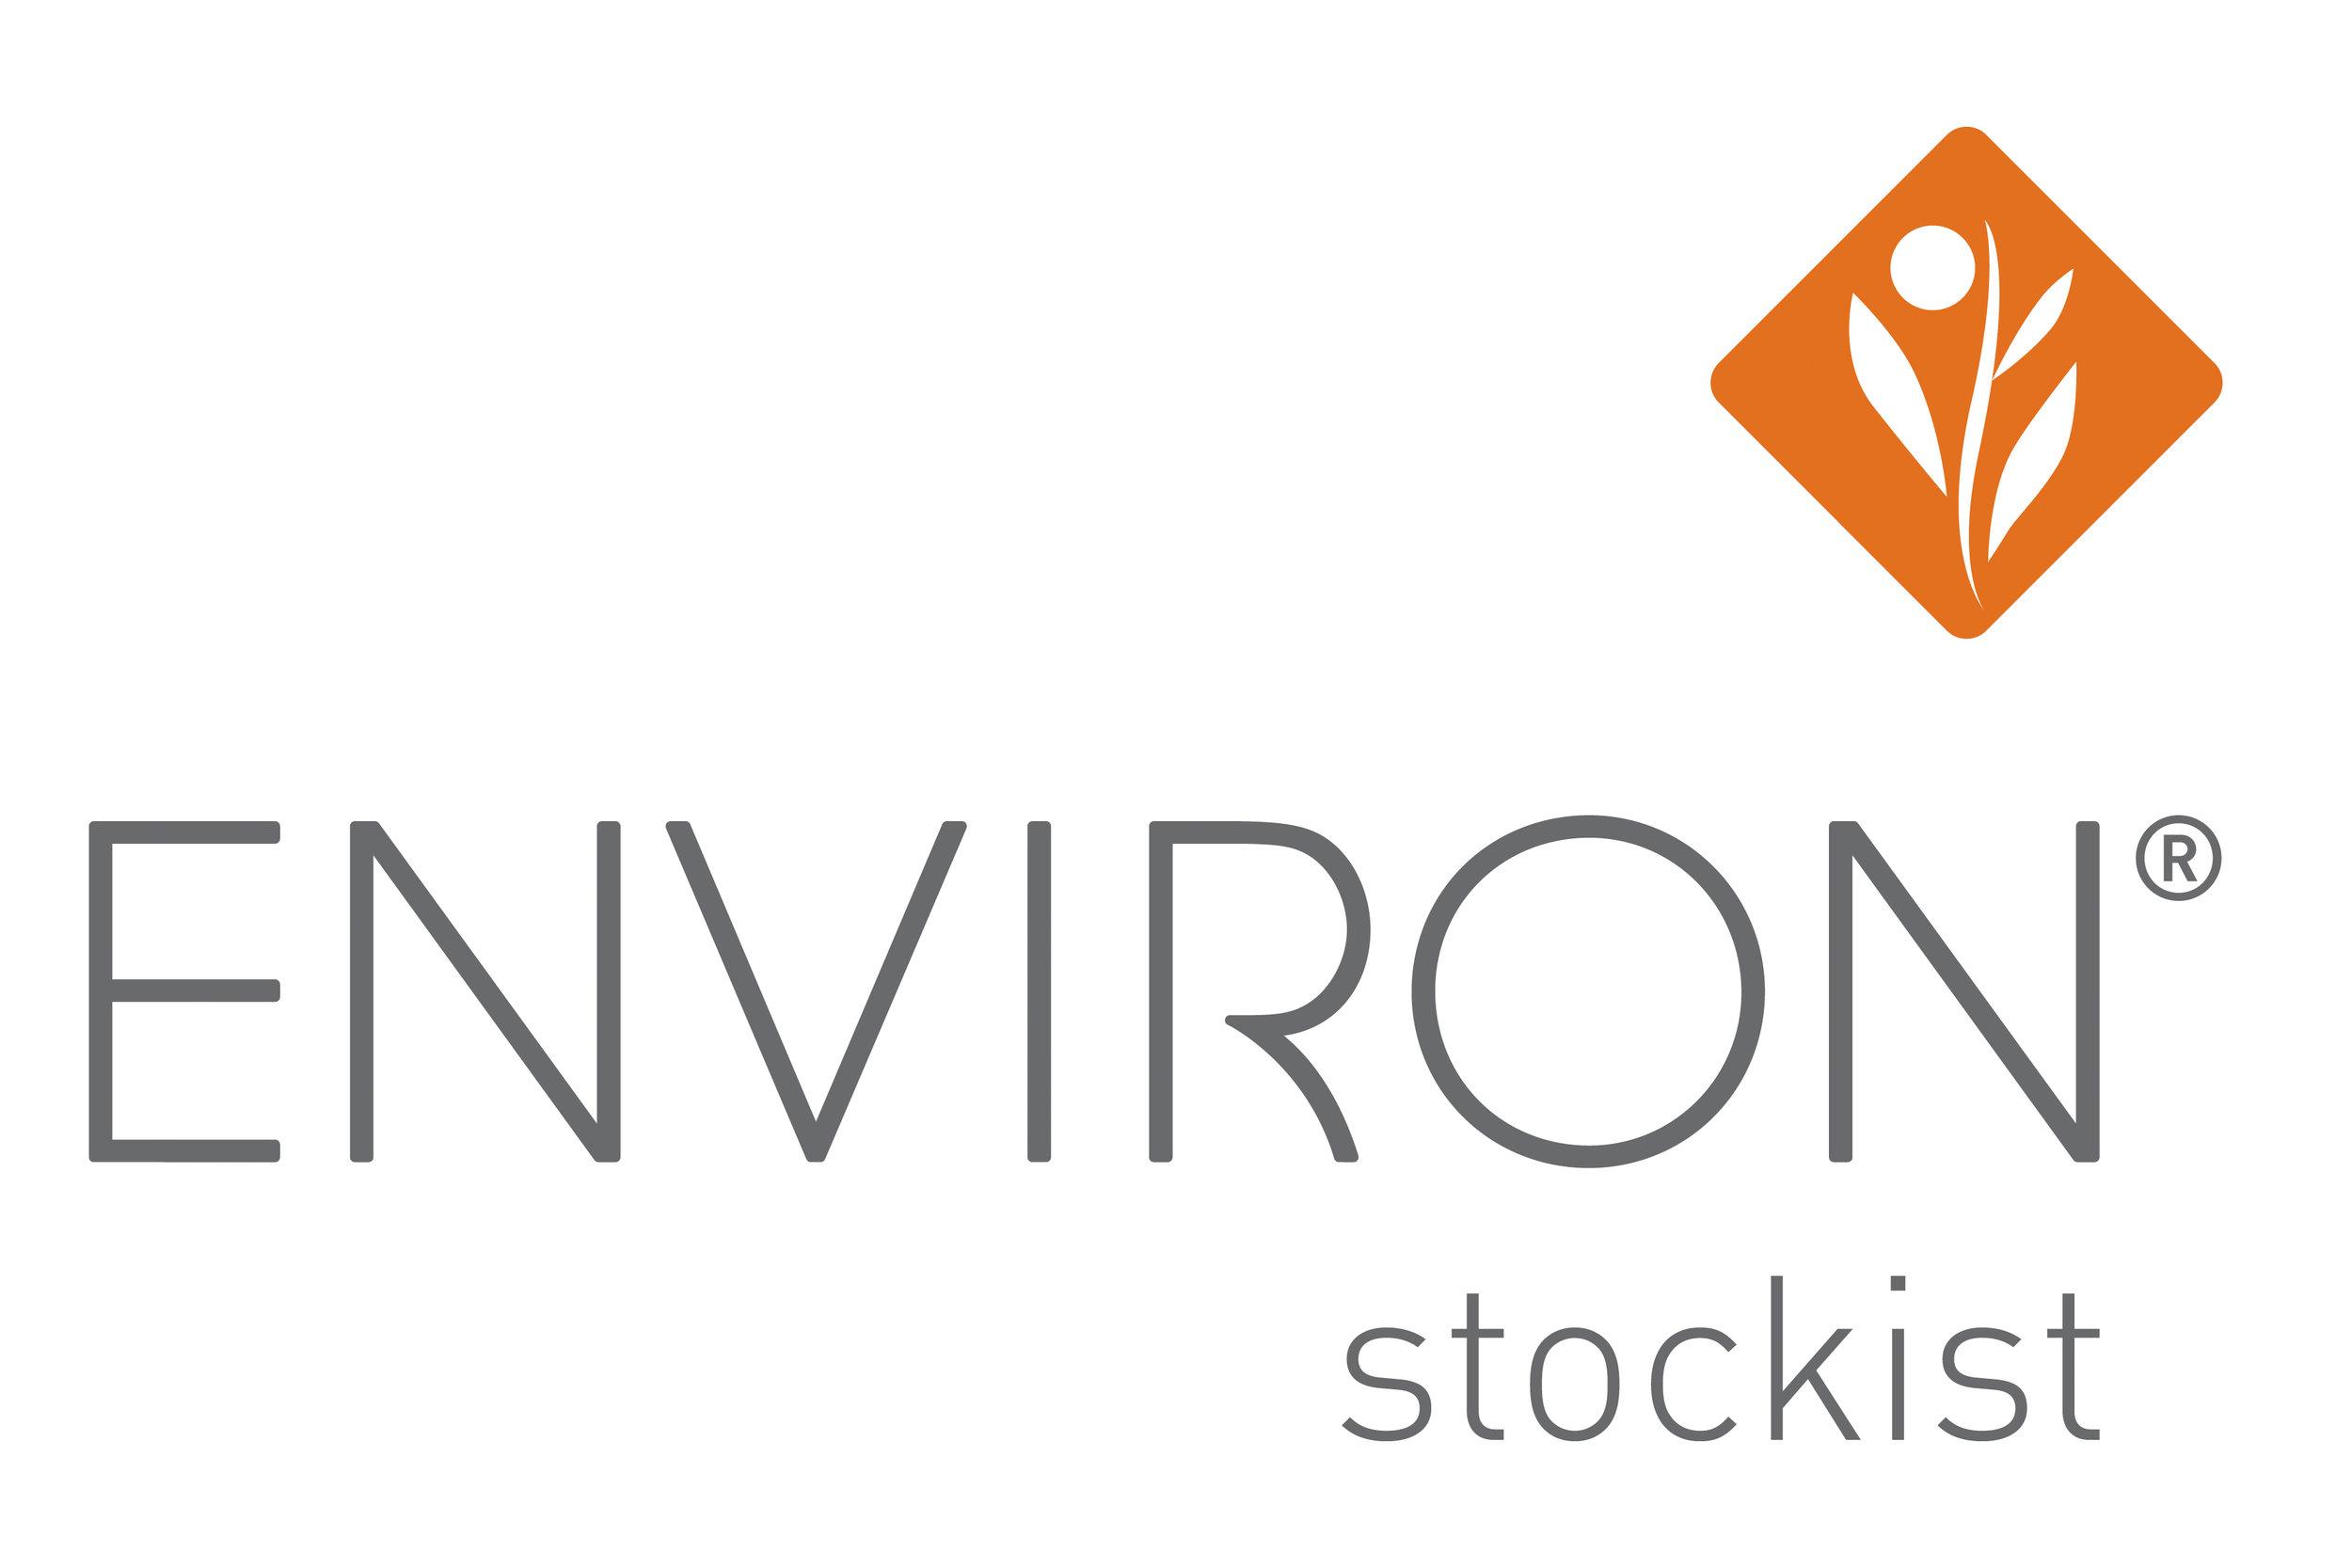 Environ Stockist logo + R.jpg